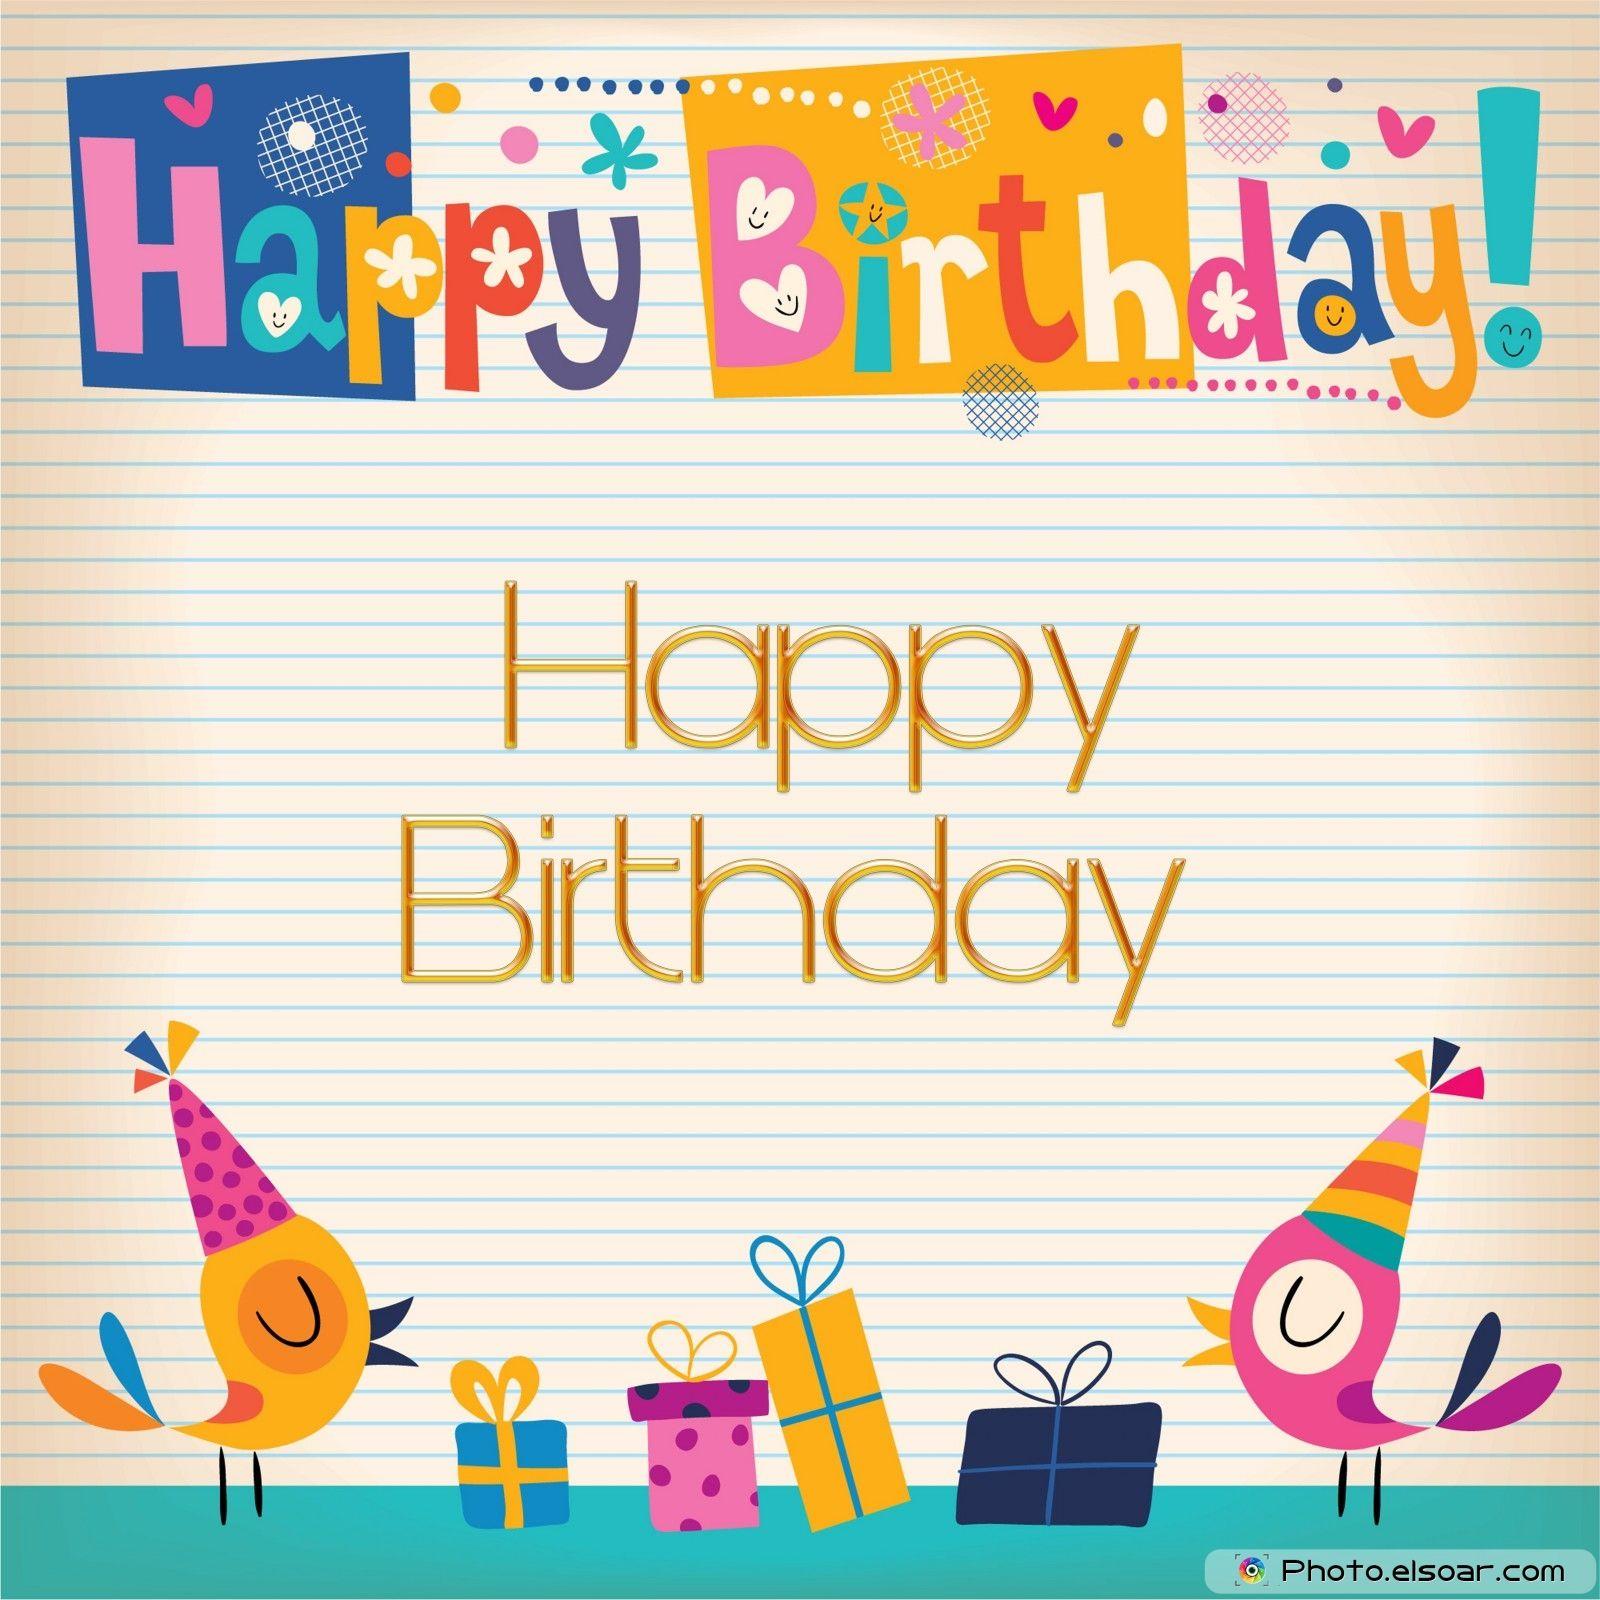 Happy Birthday card on pretty background